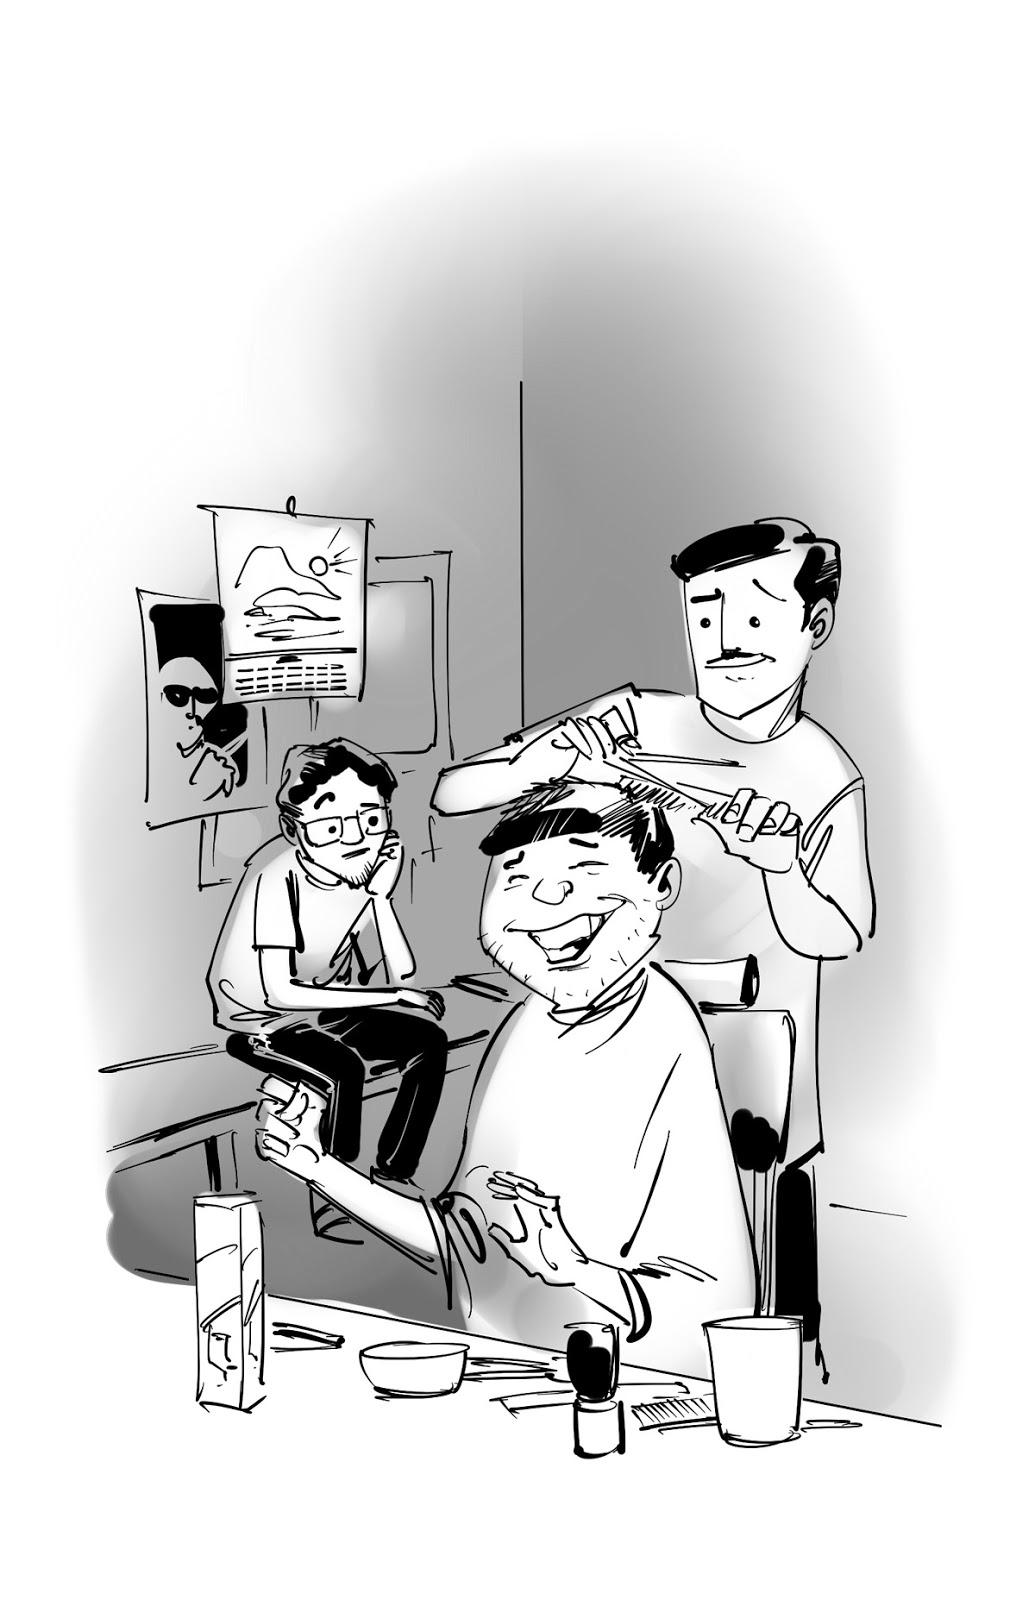 suman sarkar fau funny storybook cartoon illustration haircut saloon barber